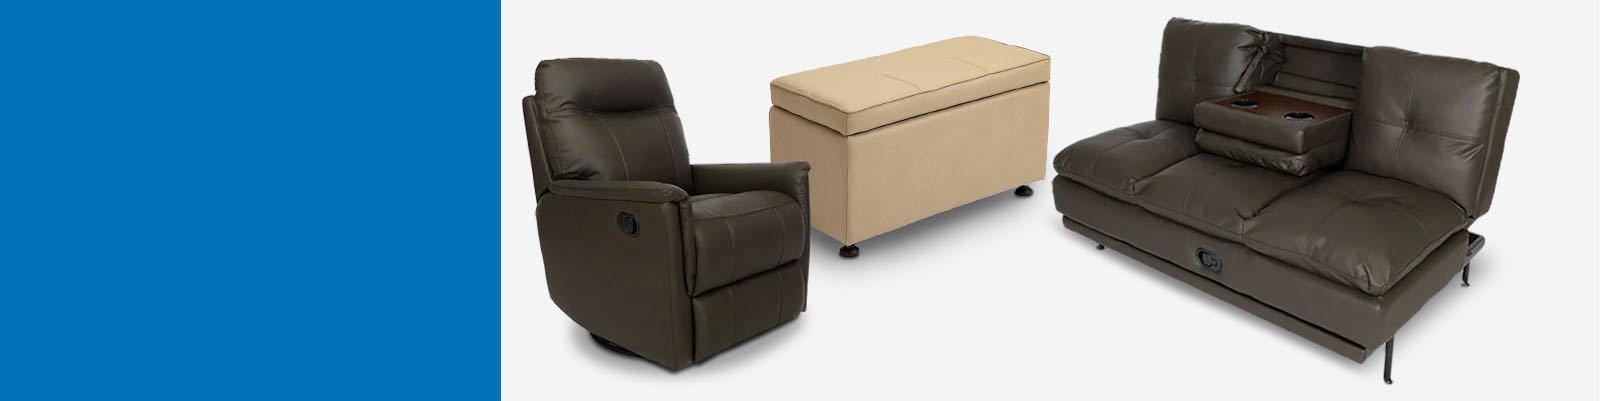 Inside Rv Interior Parts, Travel Trailer Furniture